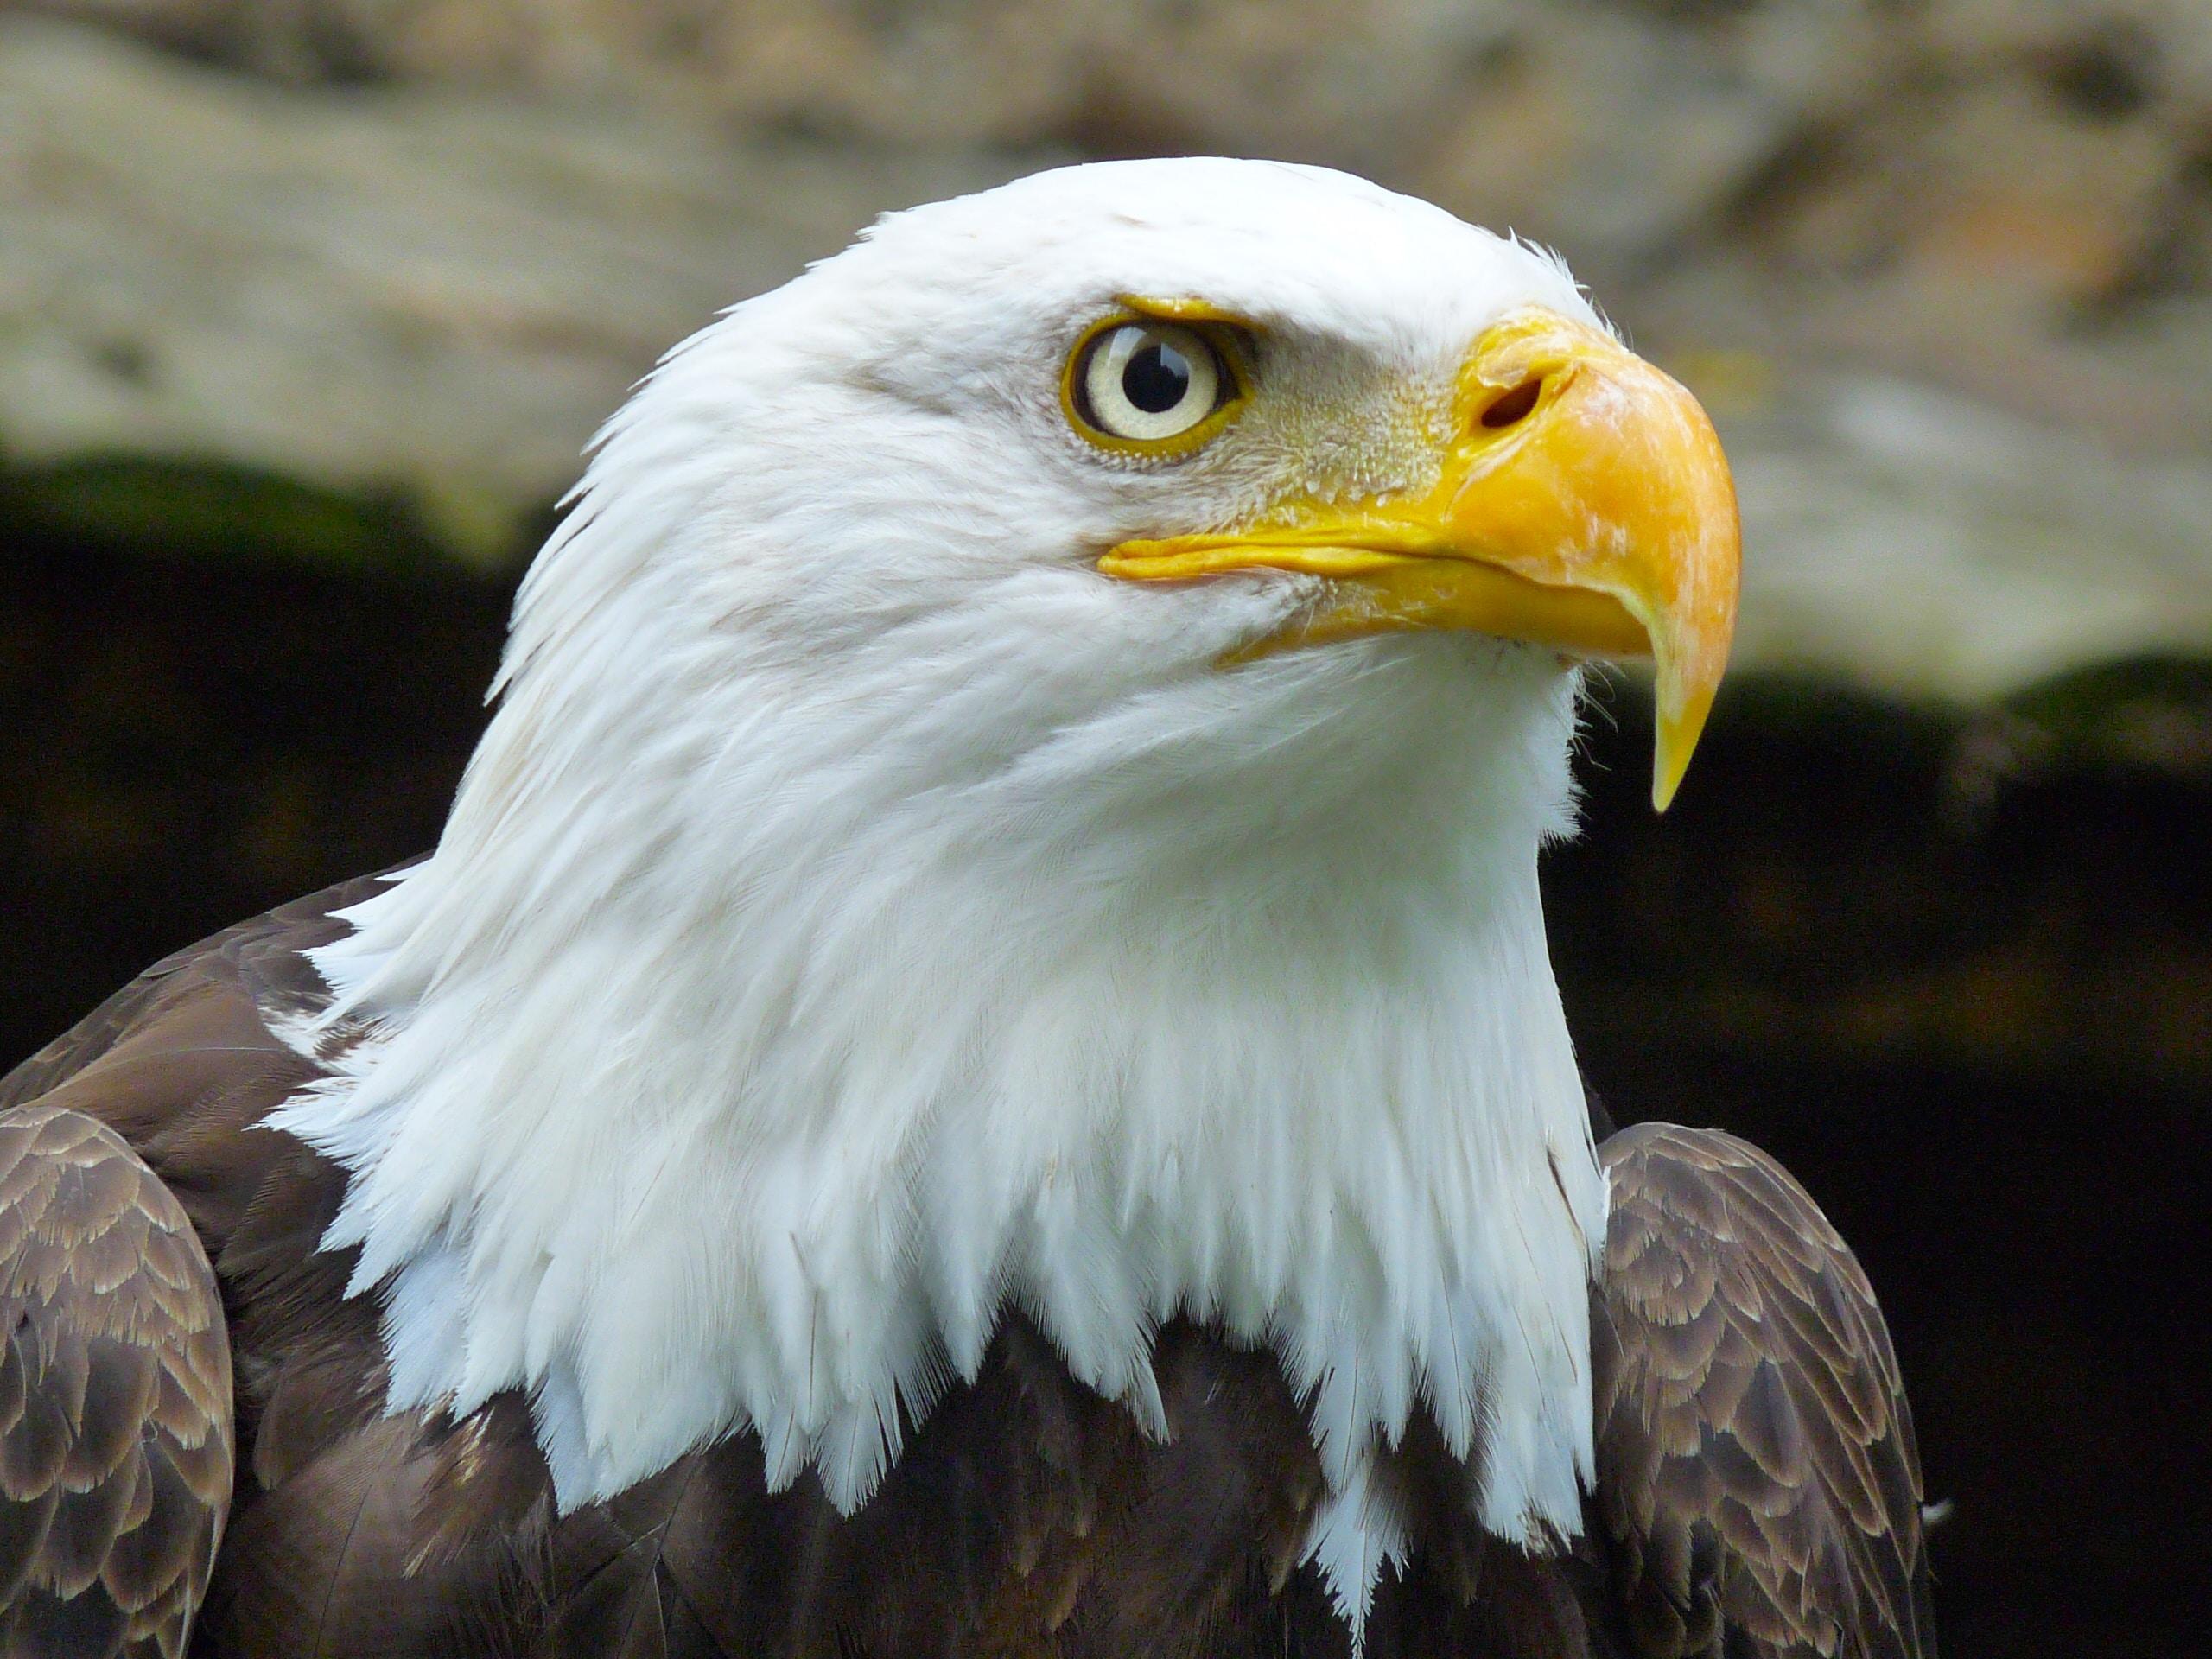 Macro of a bald eagle looking up